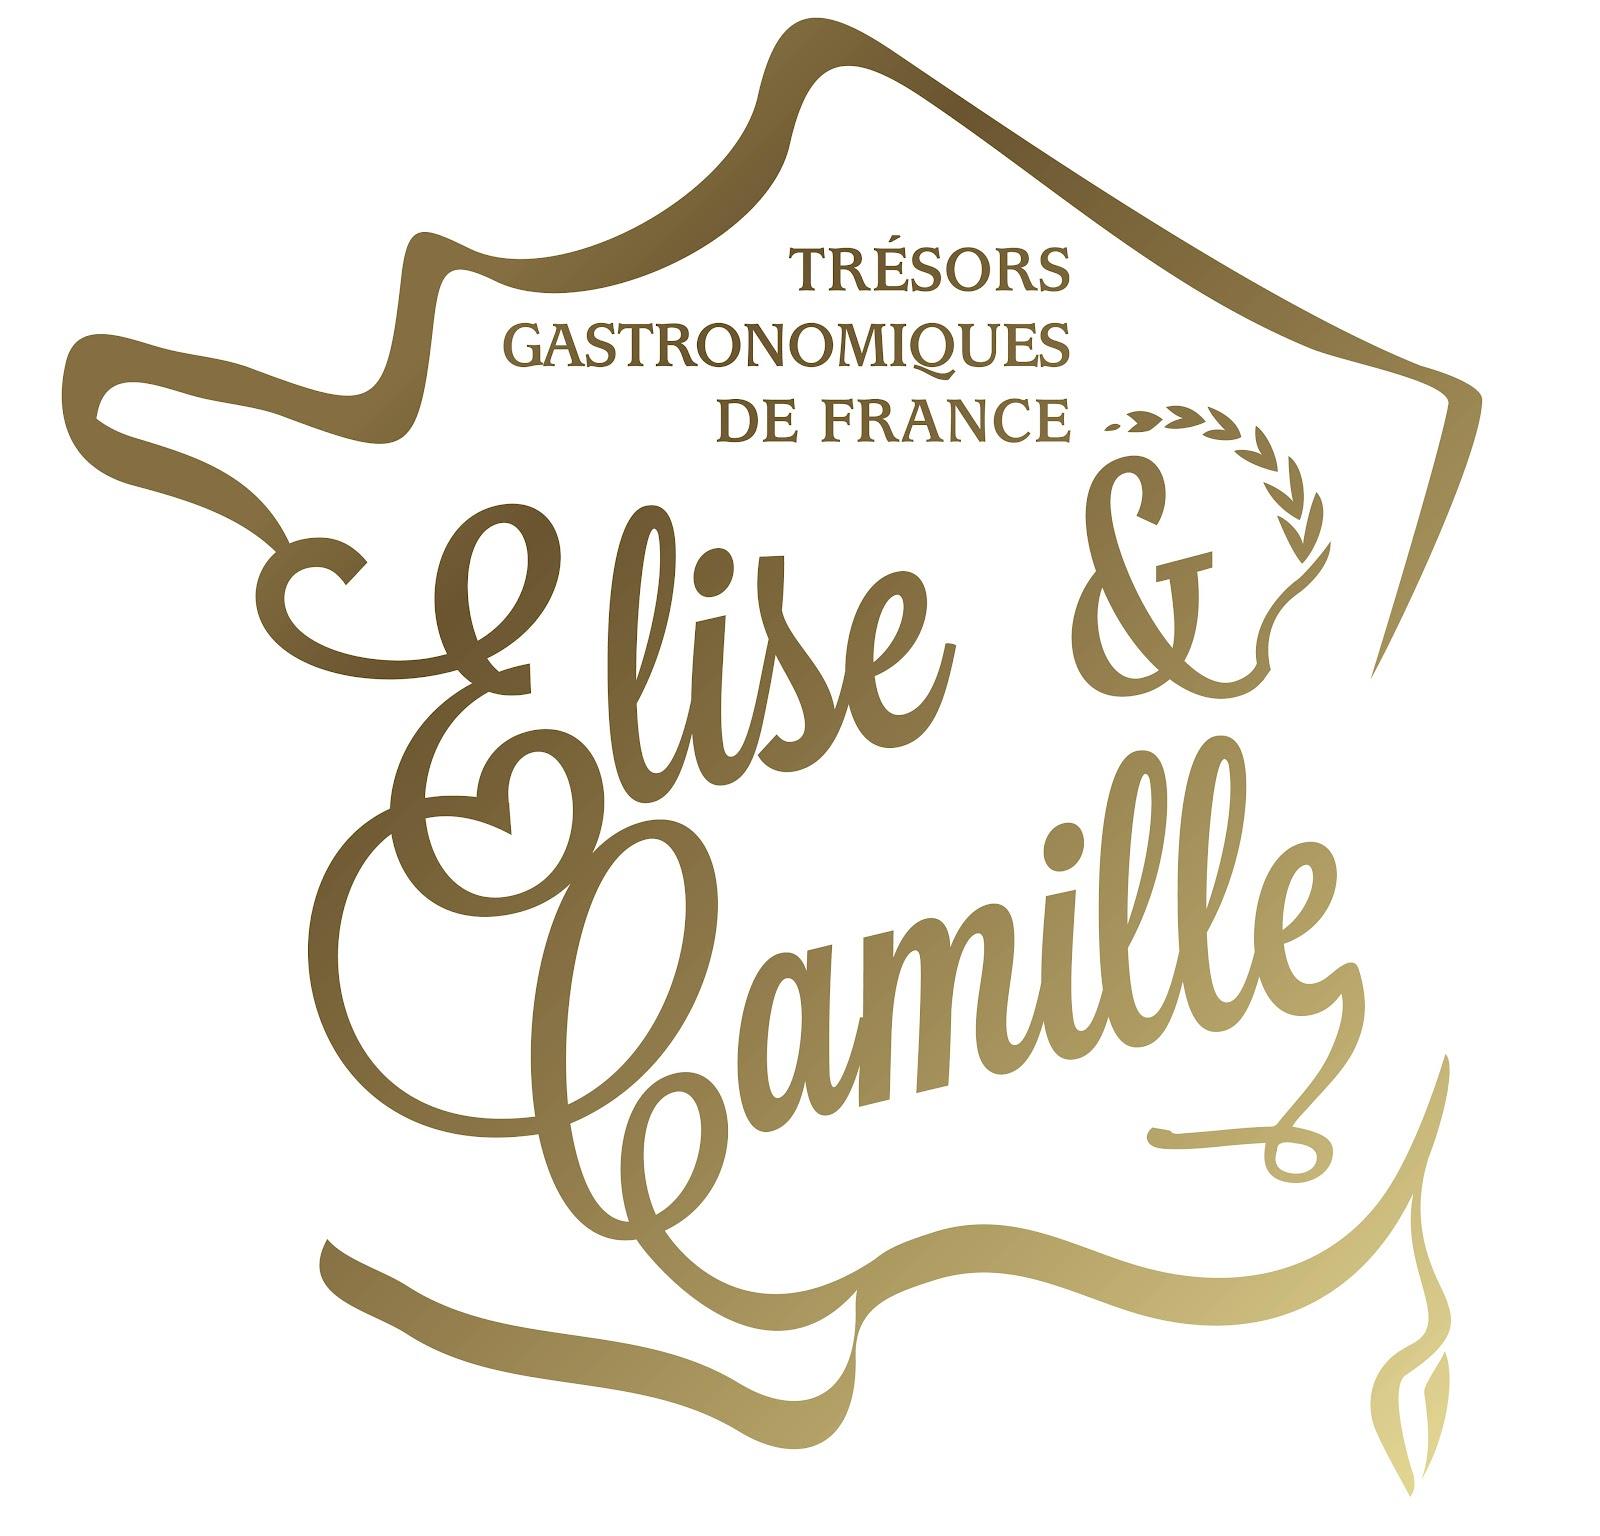 Elise&Camille_CDA0316_-03.jpg